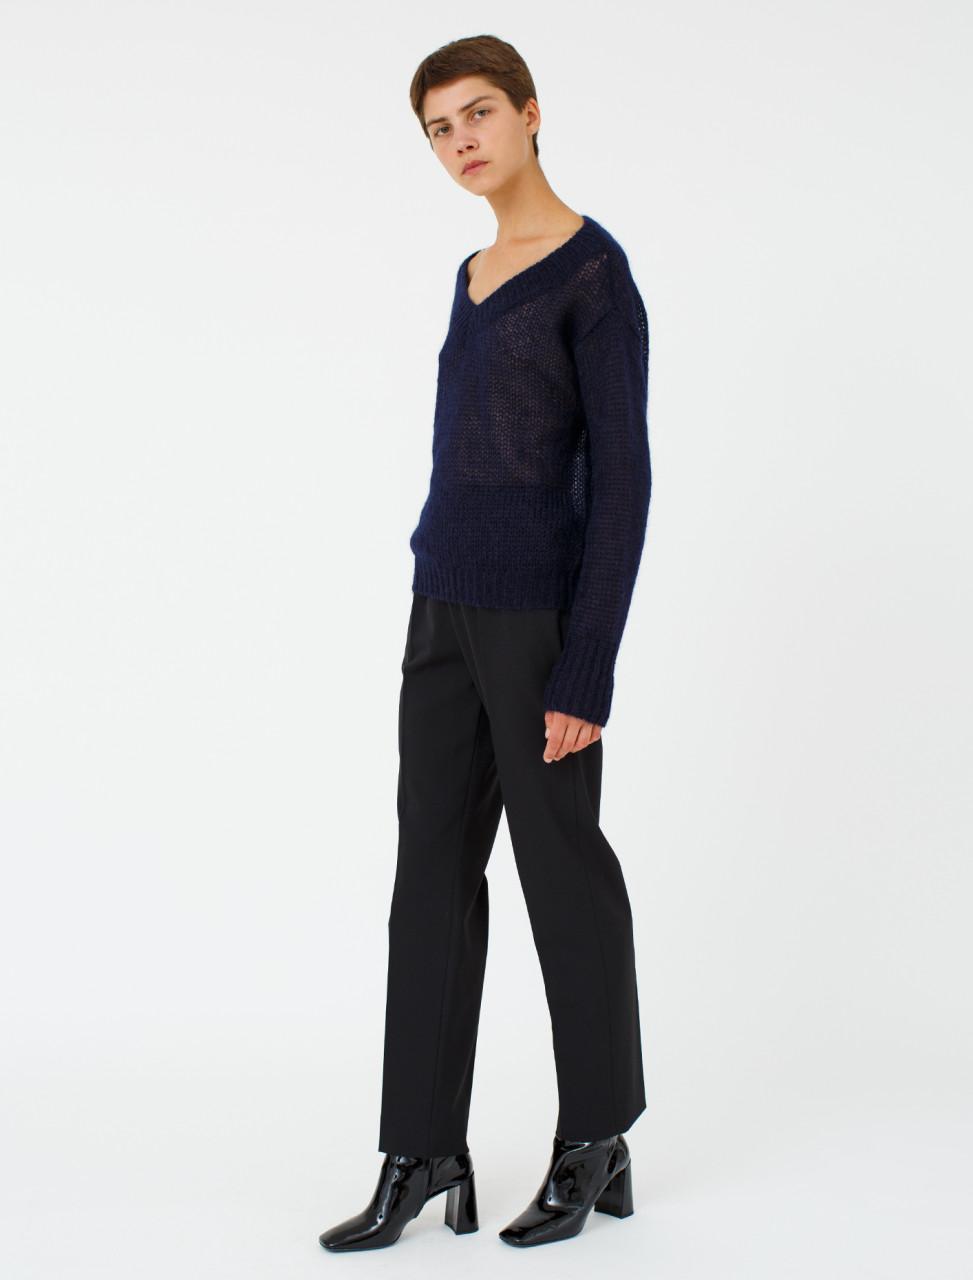 Elastic Waist Trouser